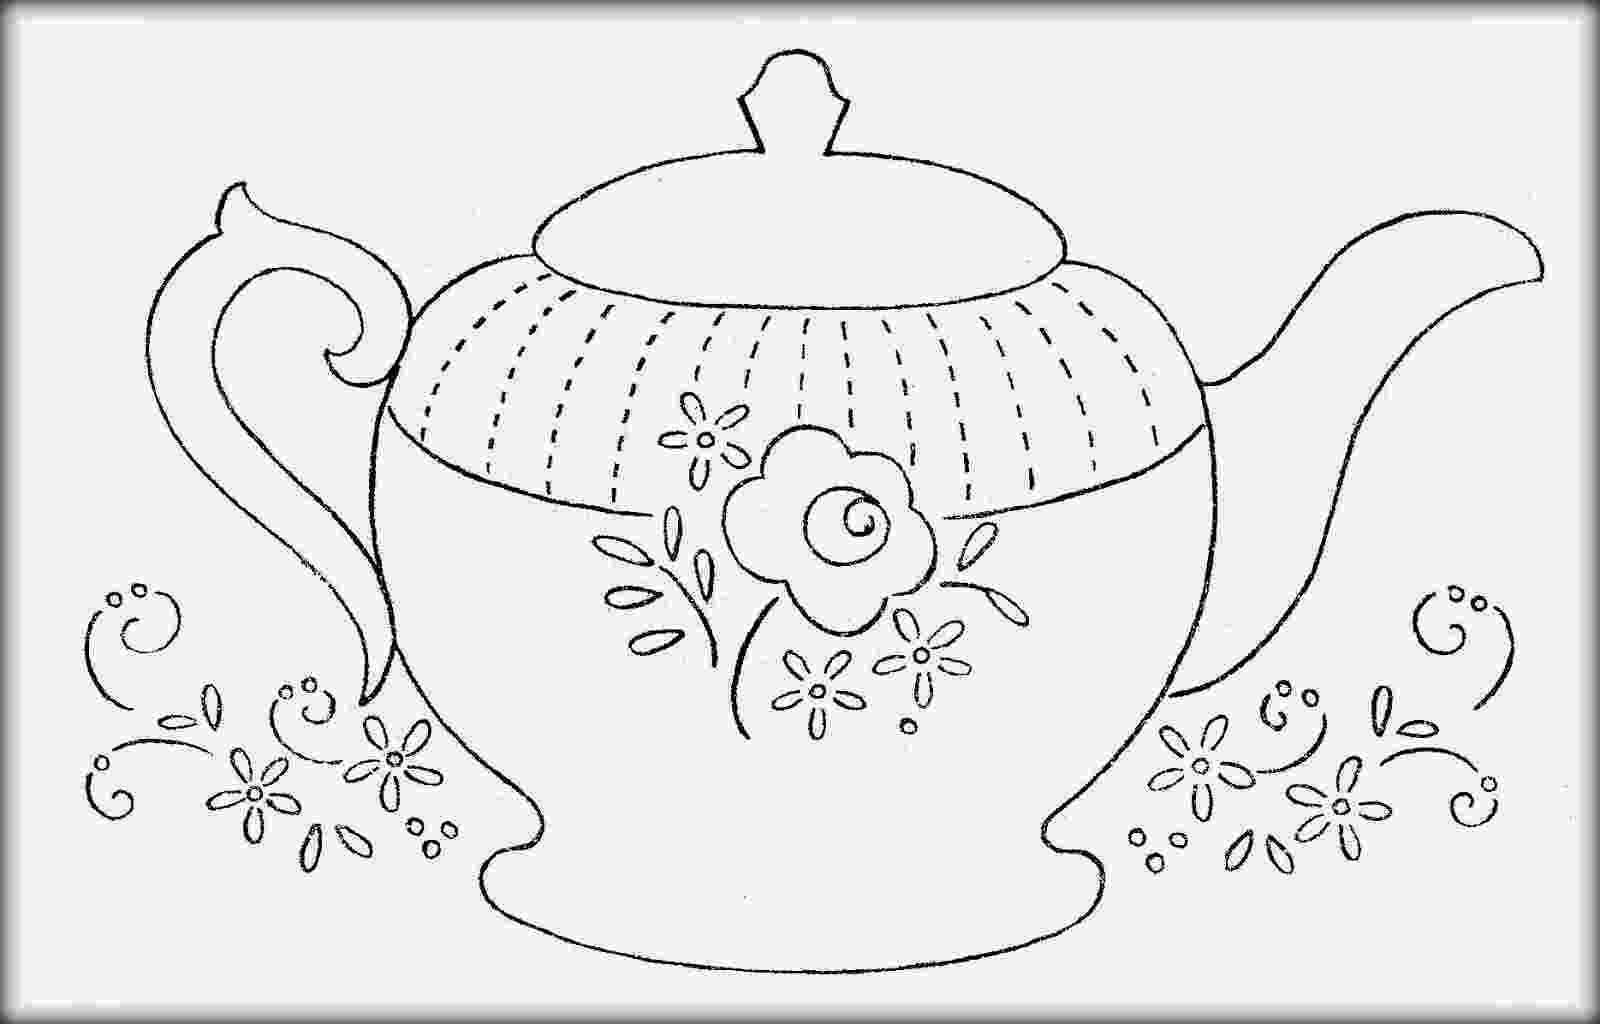 teapot colouring free teapot coloring book download free clip art free colouring teapot